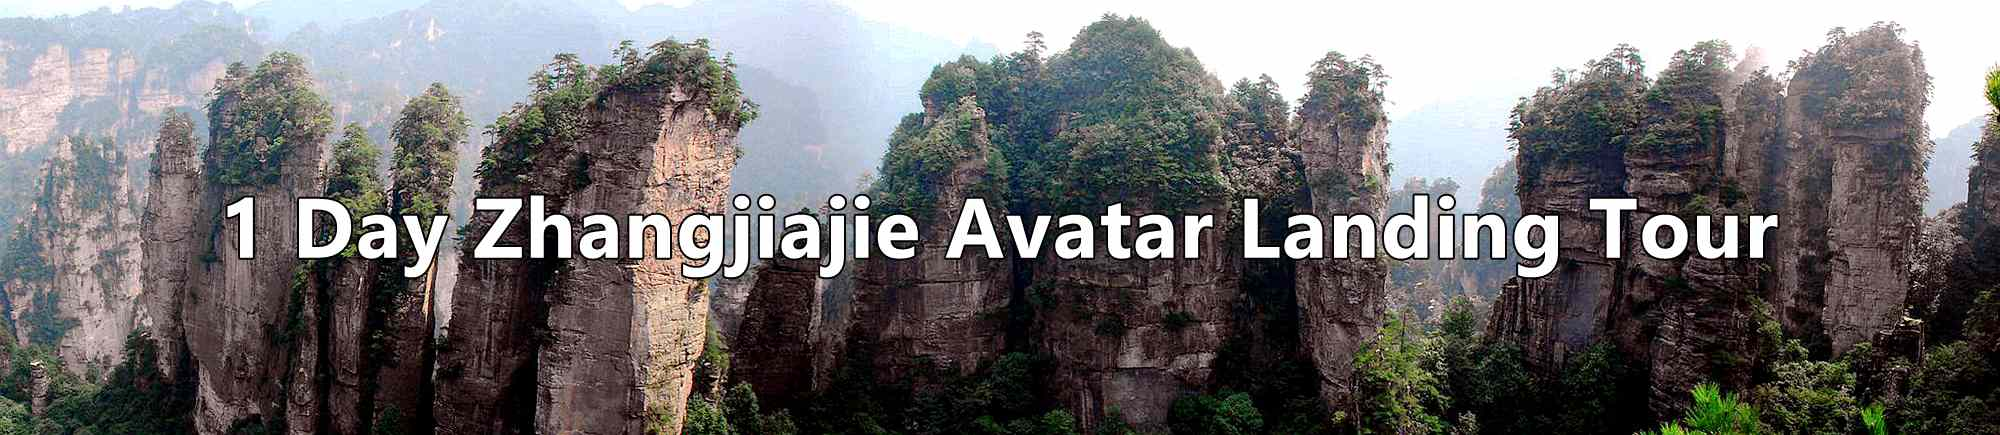 1-day-zhangjiajie-avatar-landing-tour-1.jpg